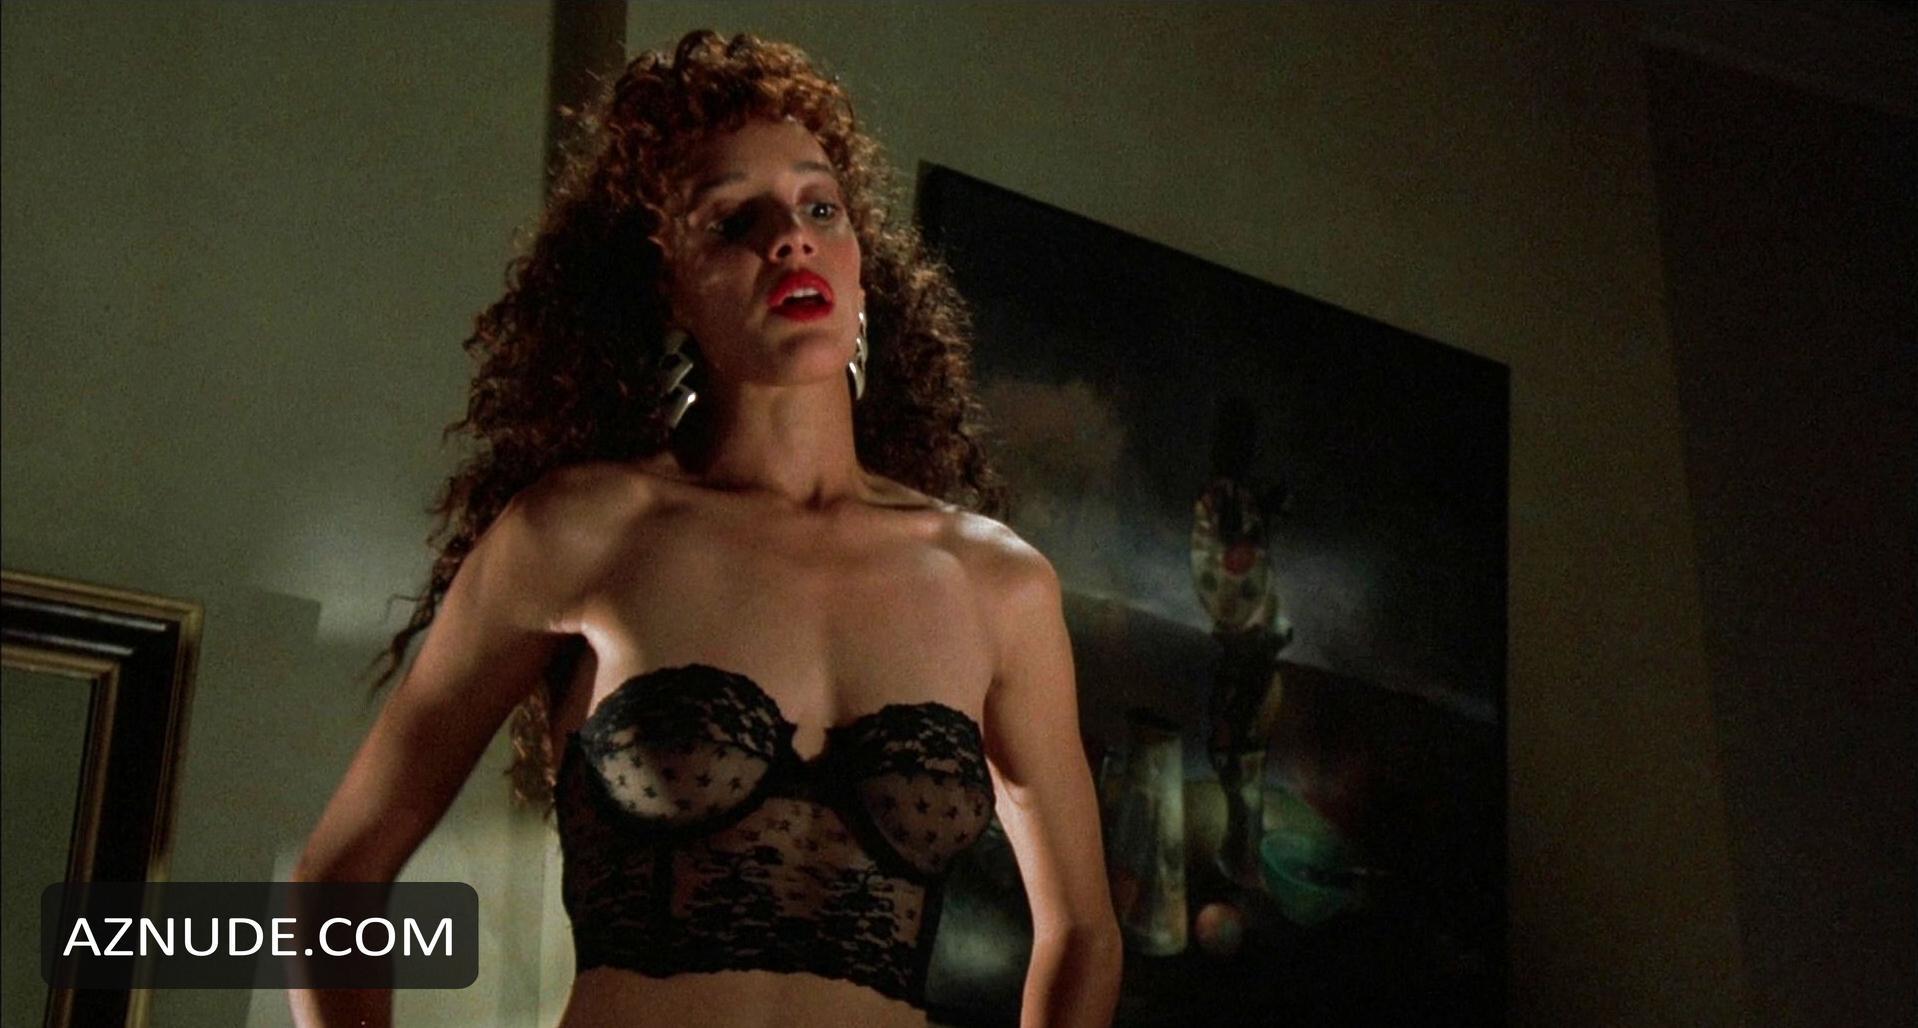 Jennifer Beals Tits nudes (71 photos), Twitter Celebrity image